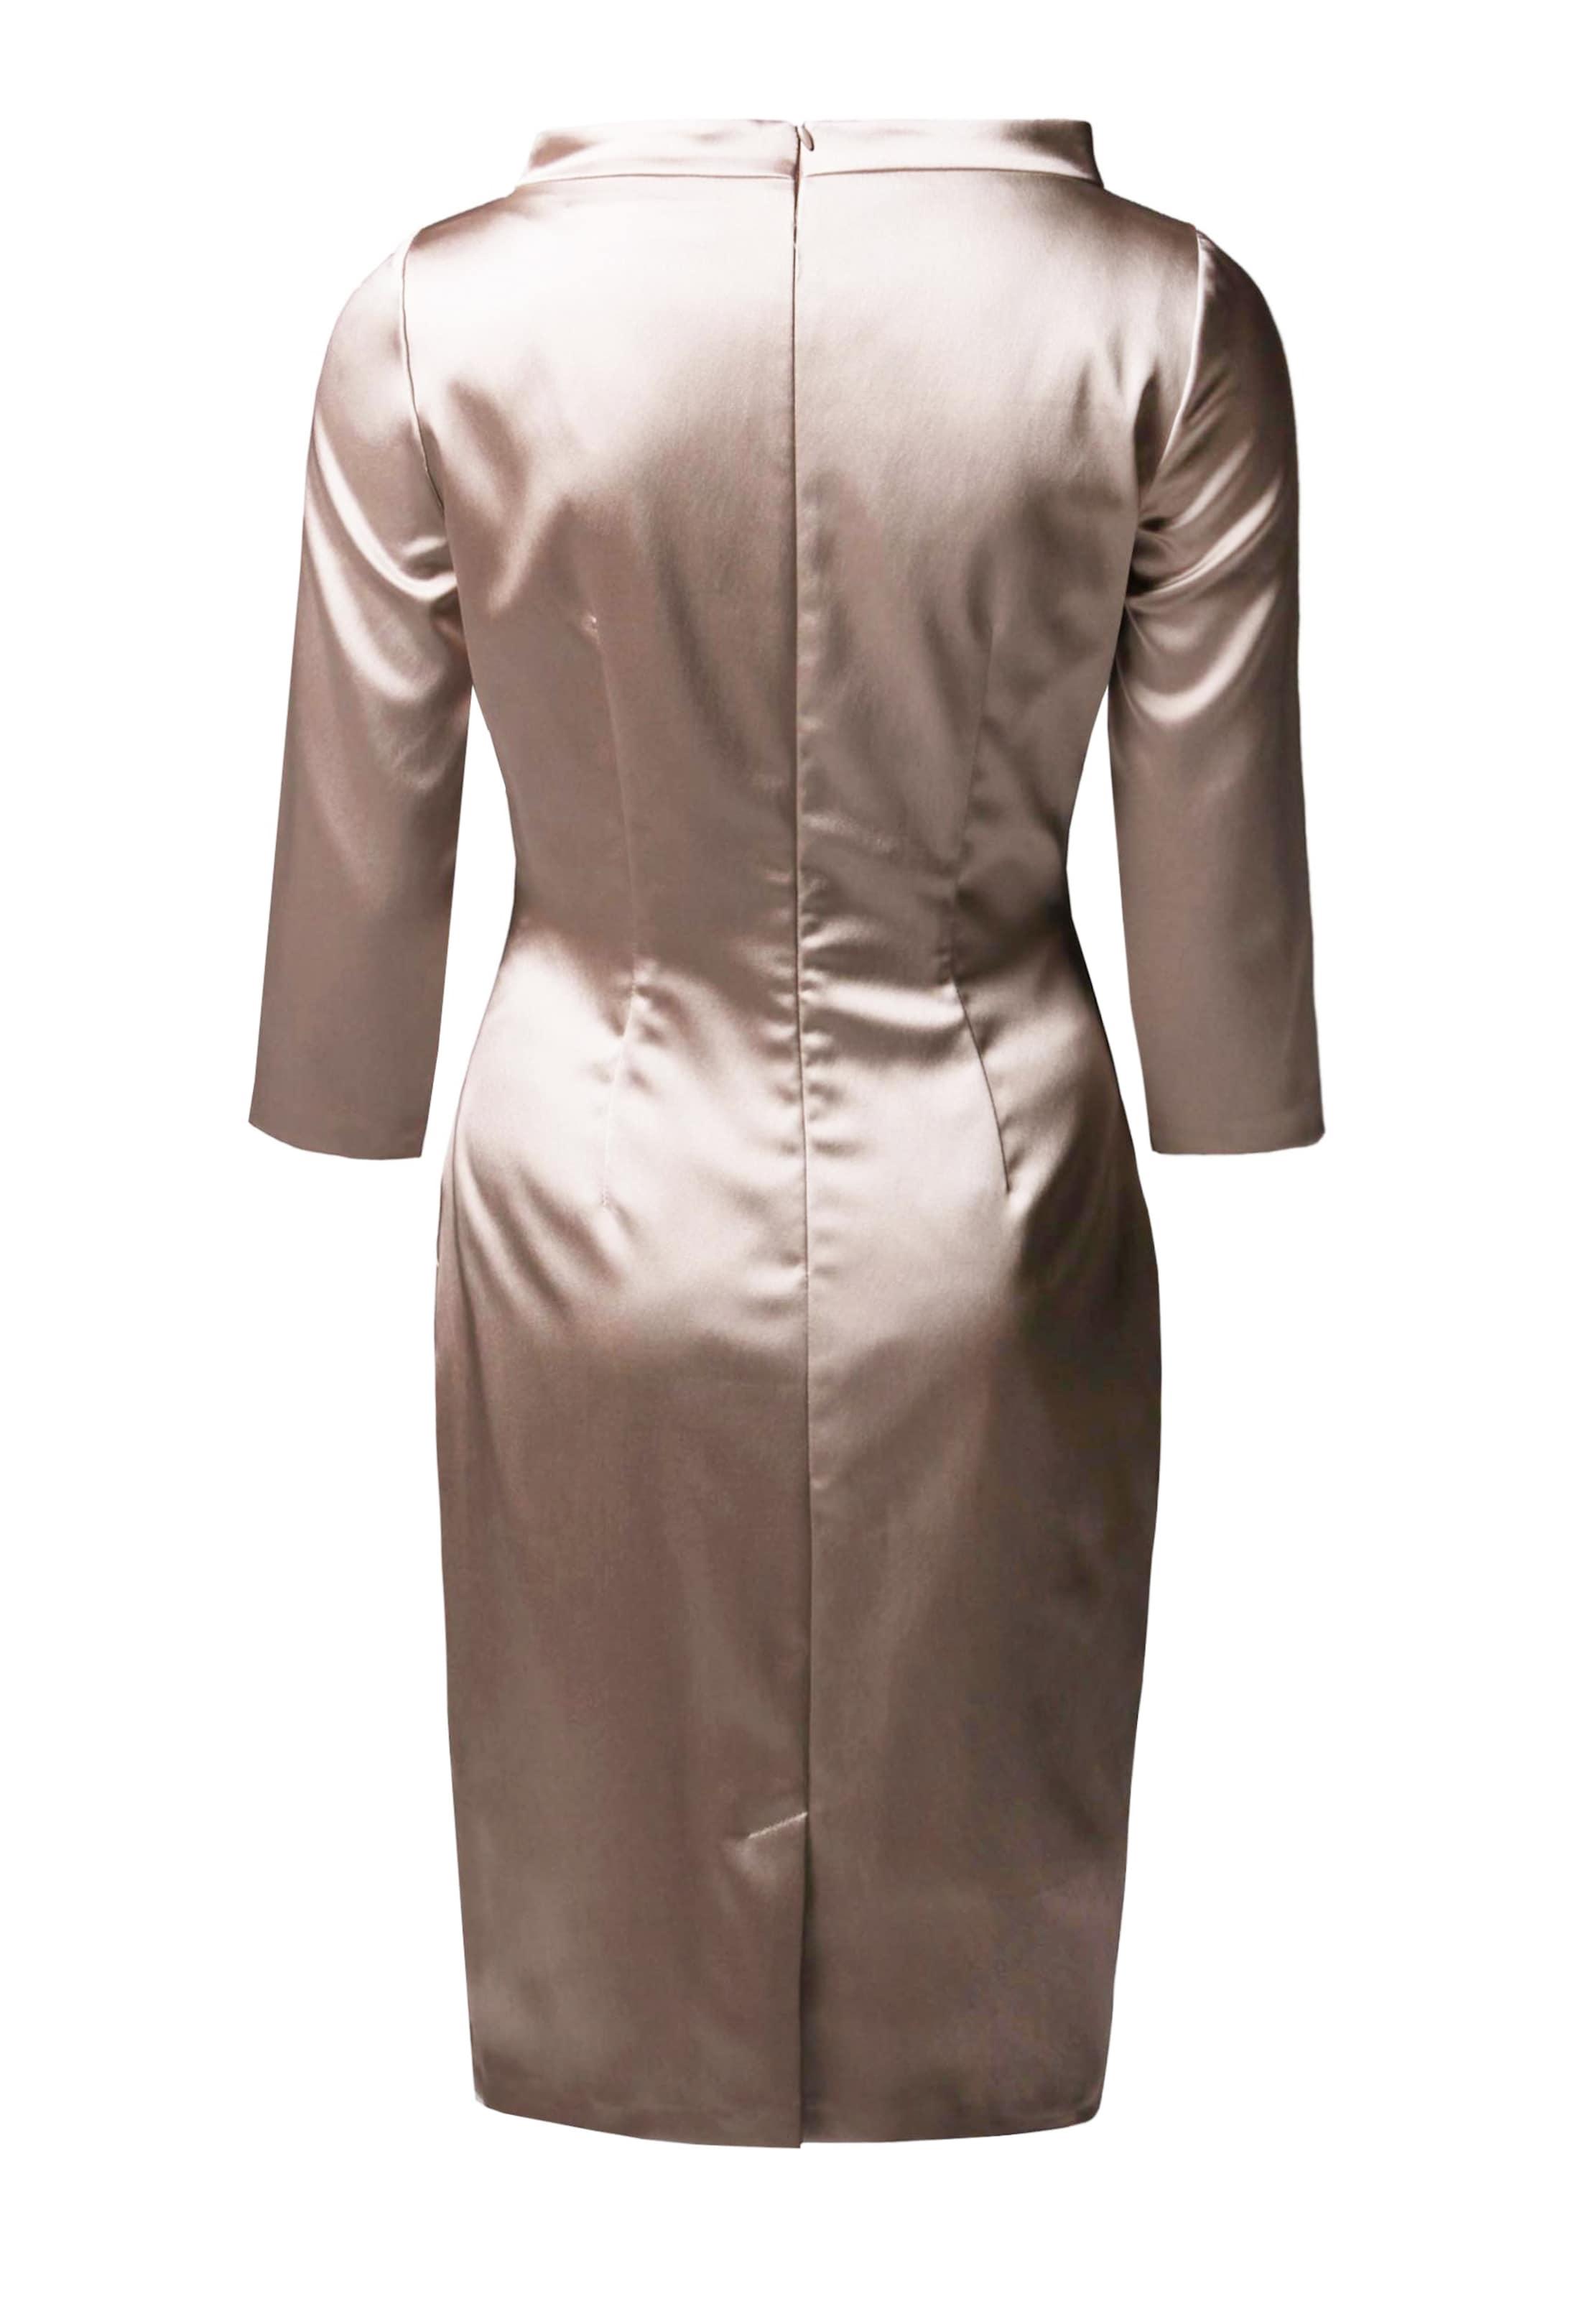 By Barbara BeigeGreige Young En Schwarzer Fourreau Robe Couture hotQsCrdxB